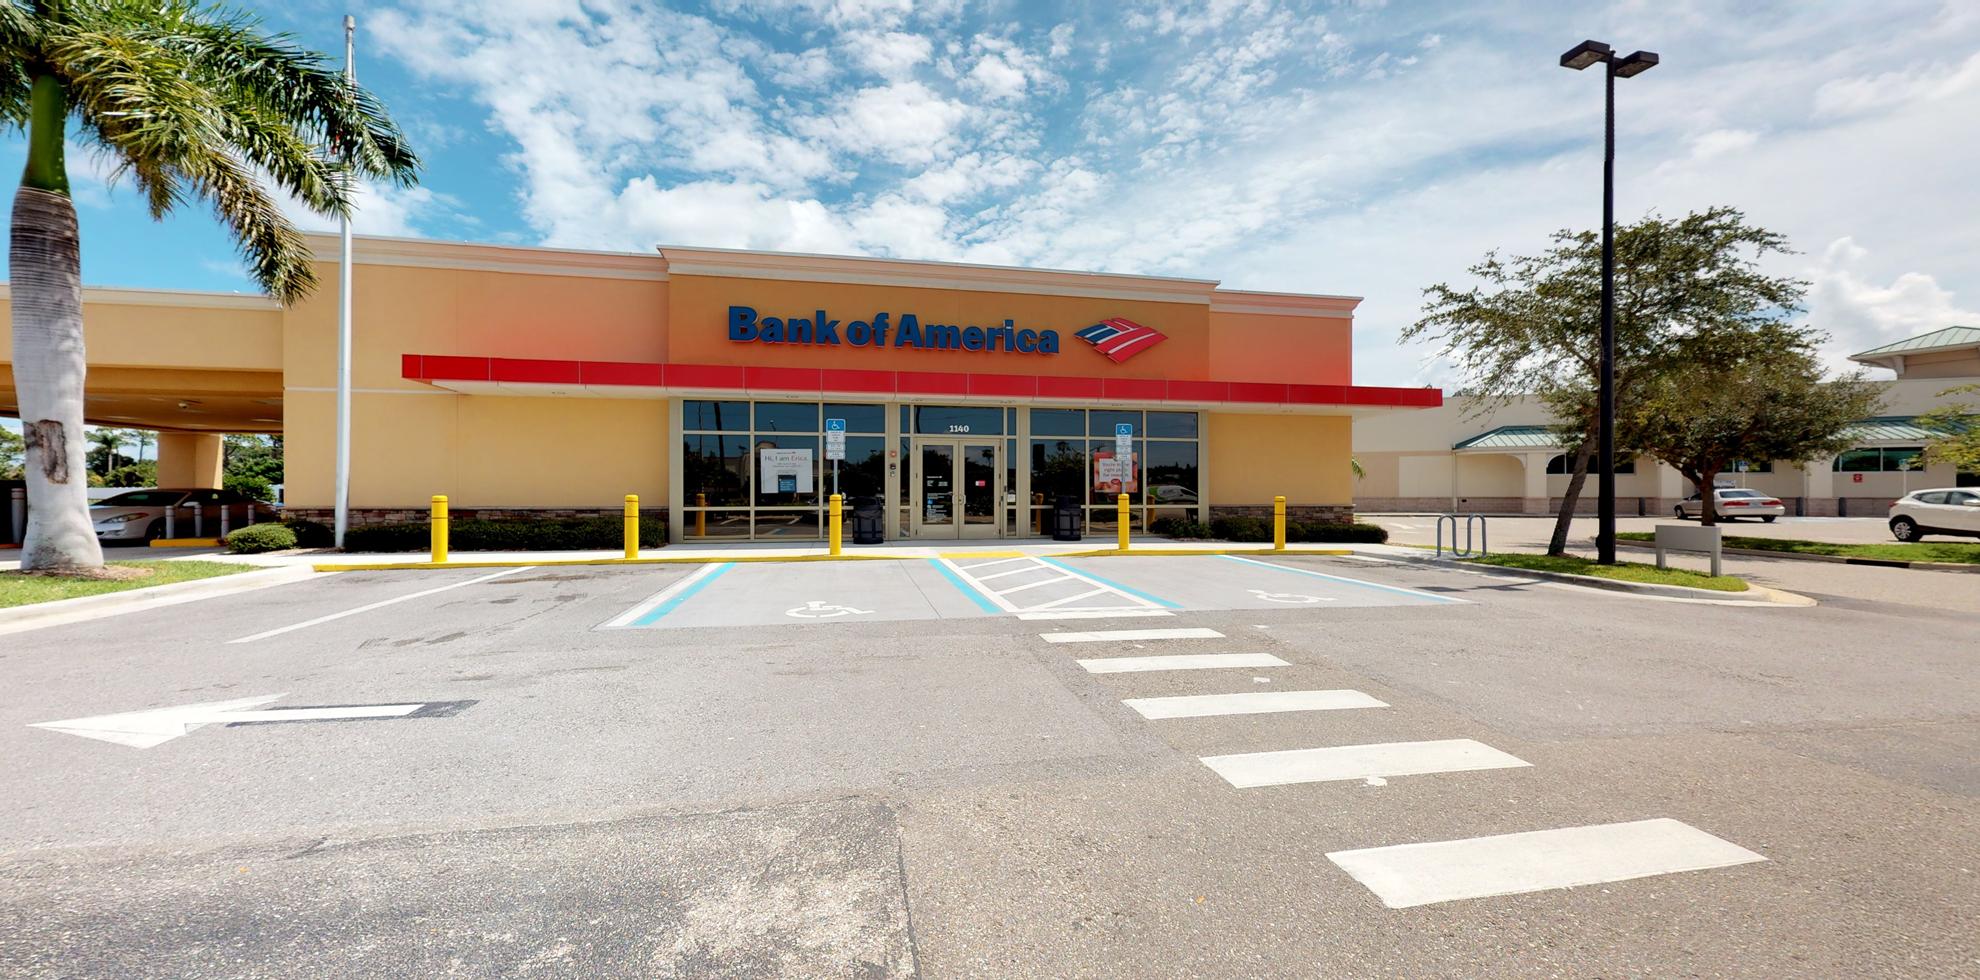 Bank of America financial center with drive-thru ATM | 1140 Tamiami Trl N, Nokomis, FL 34275